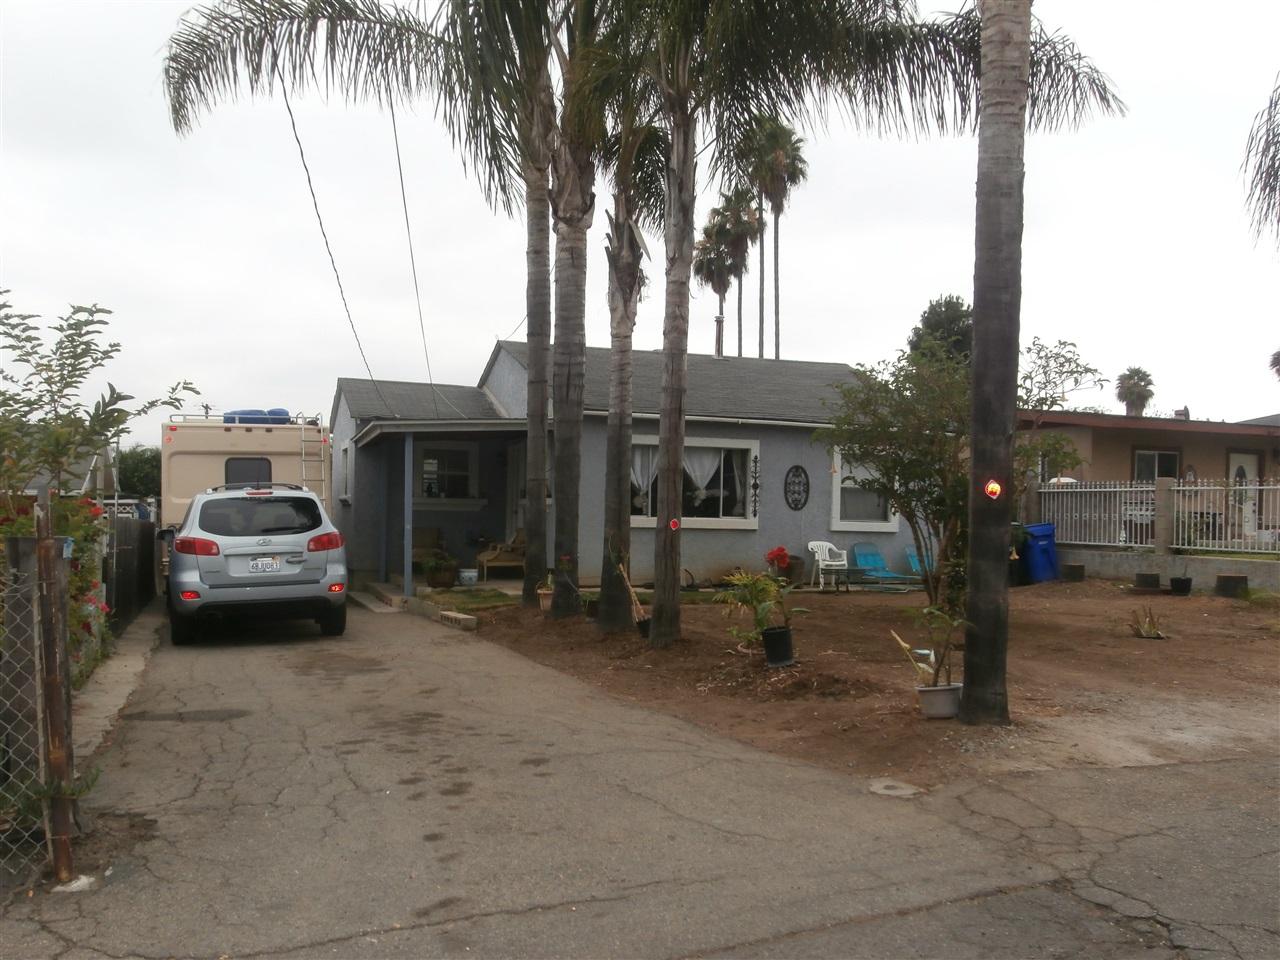 128 Nevada Avenue, Vista, CA 92084